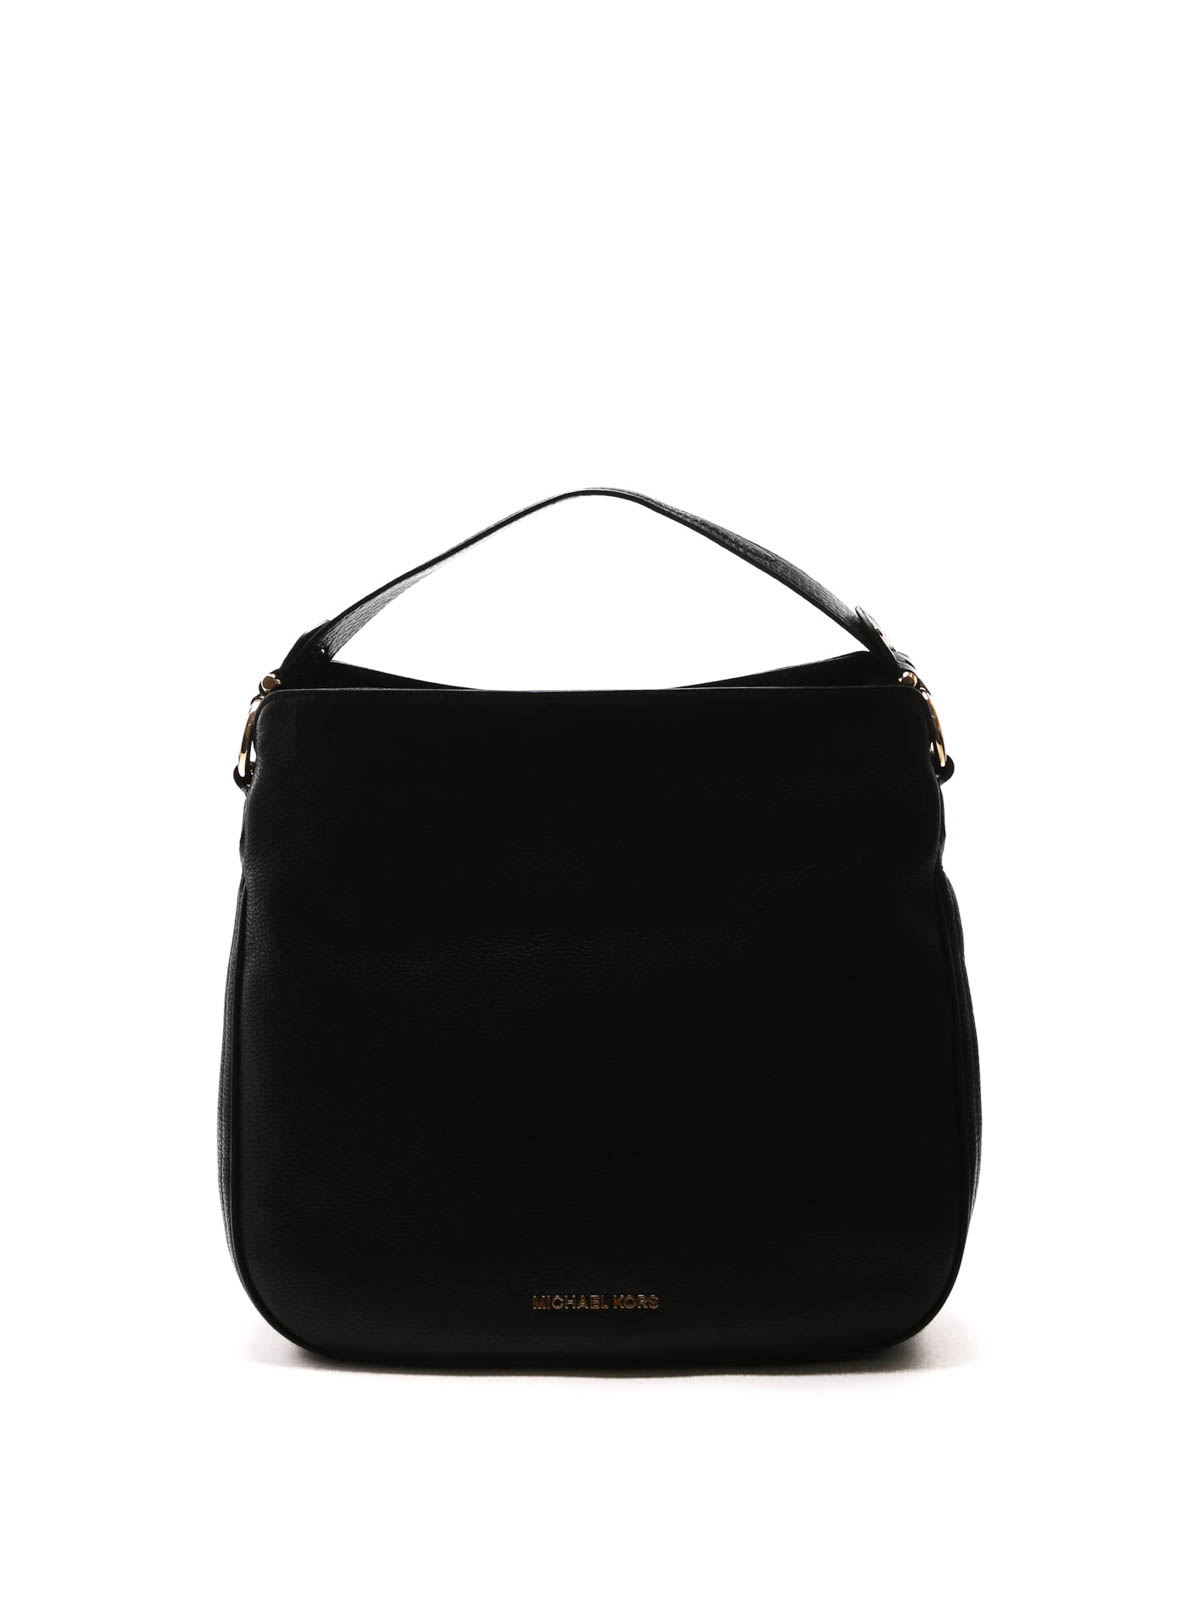 b181b552f7 Michael Kors - Heidi medium hobo leather bag - shoulder bags ...